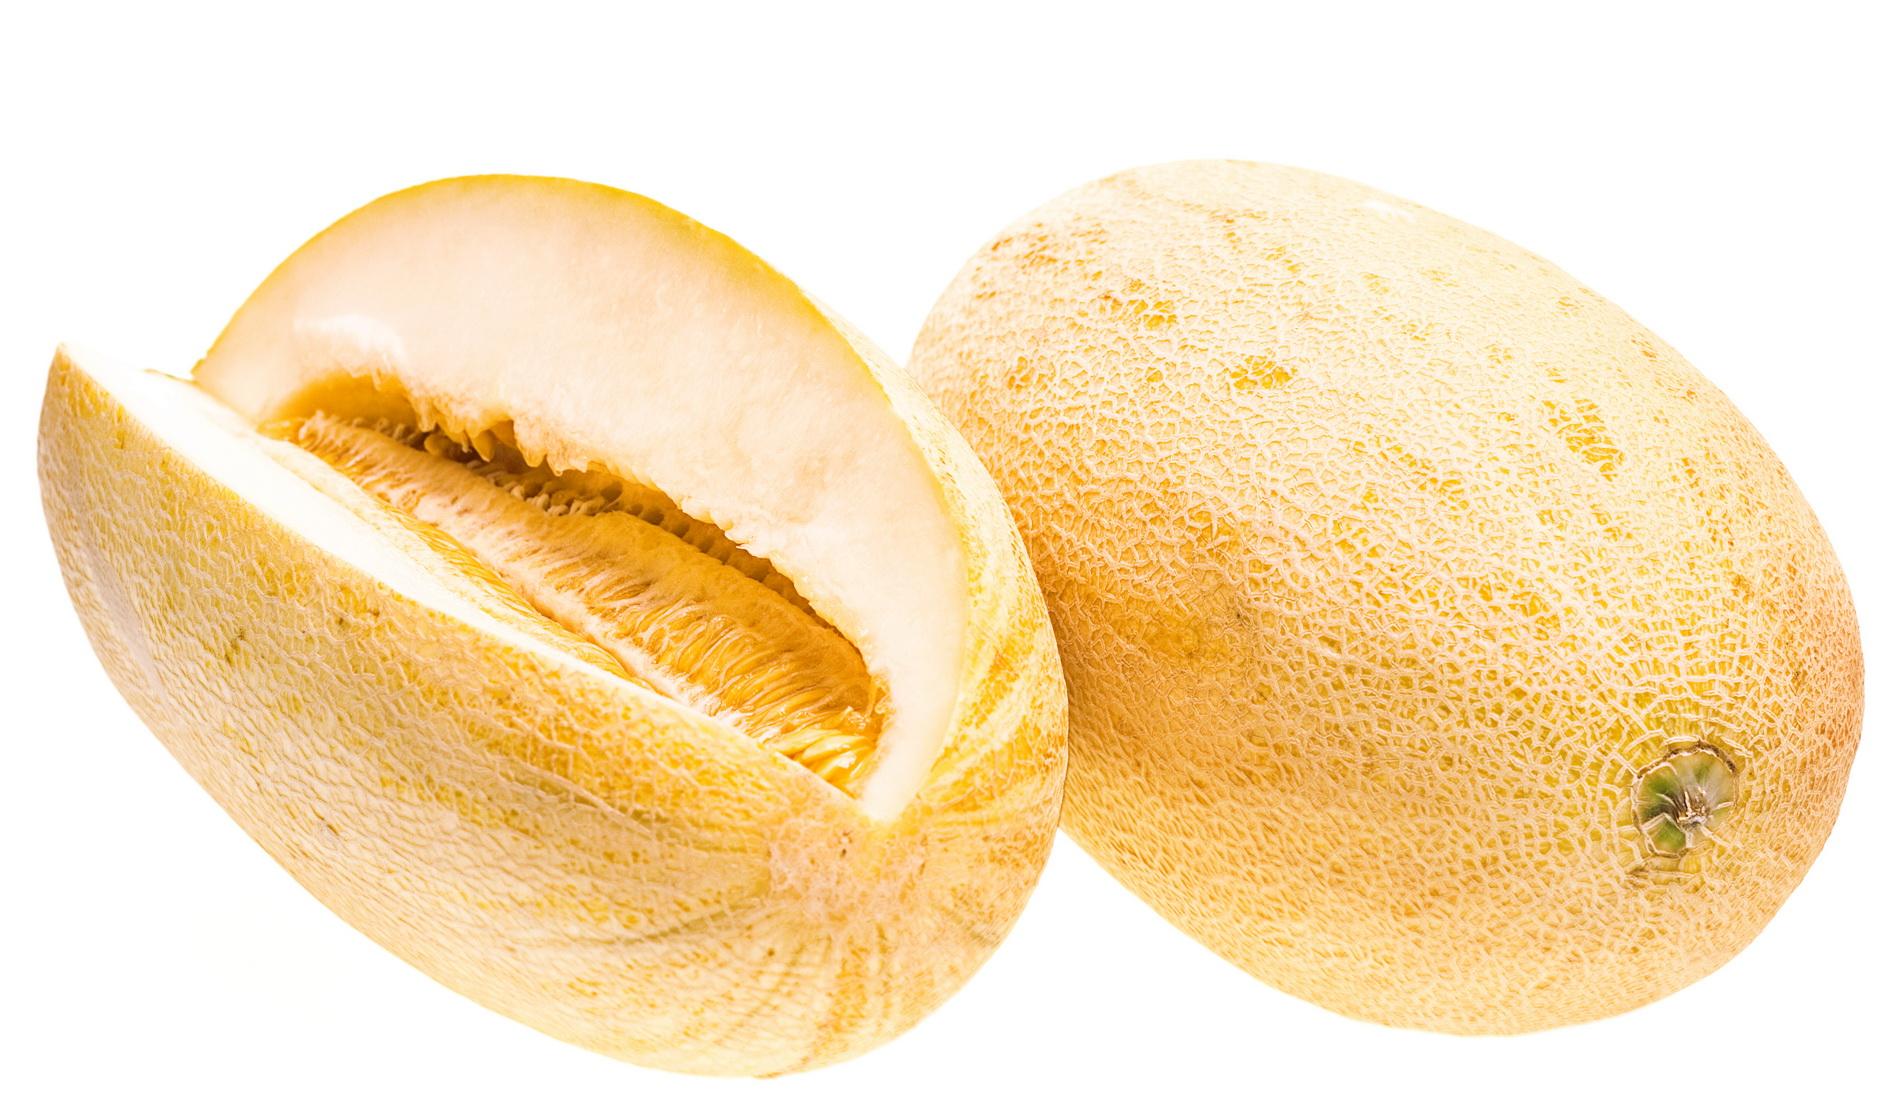 Yellow Melons, Tasty, Ripe, Tropical, Vitamin, HQ Photo